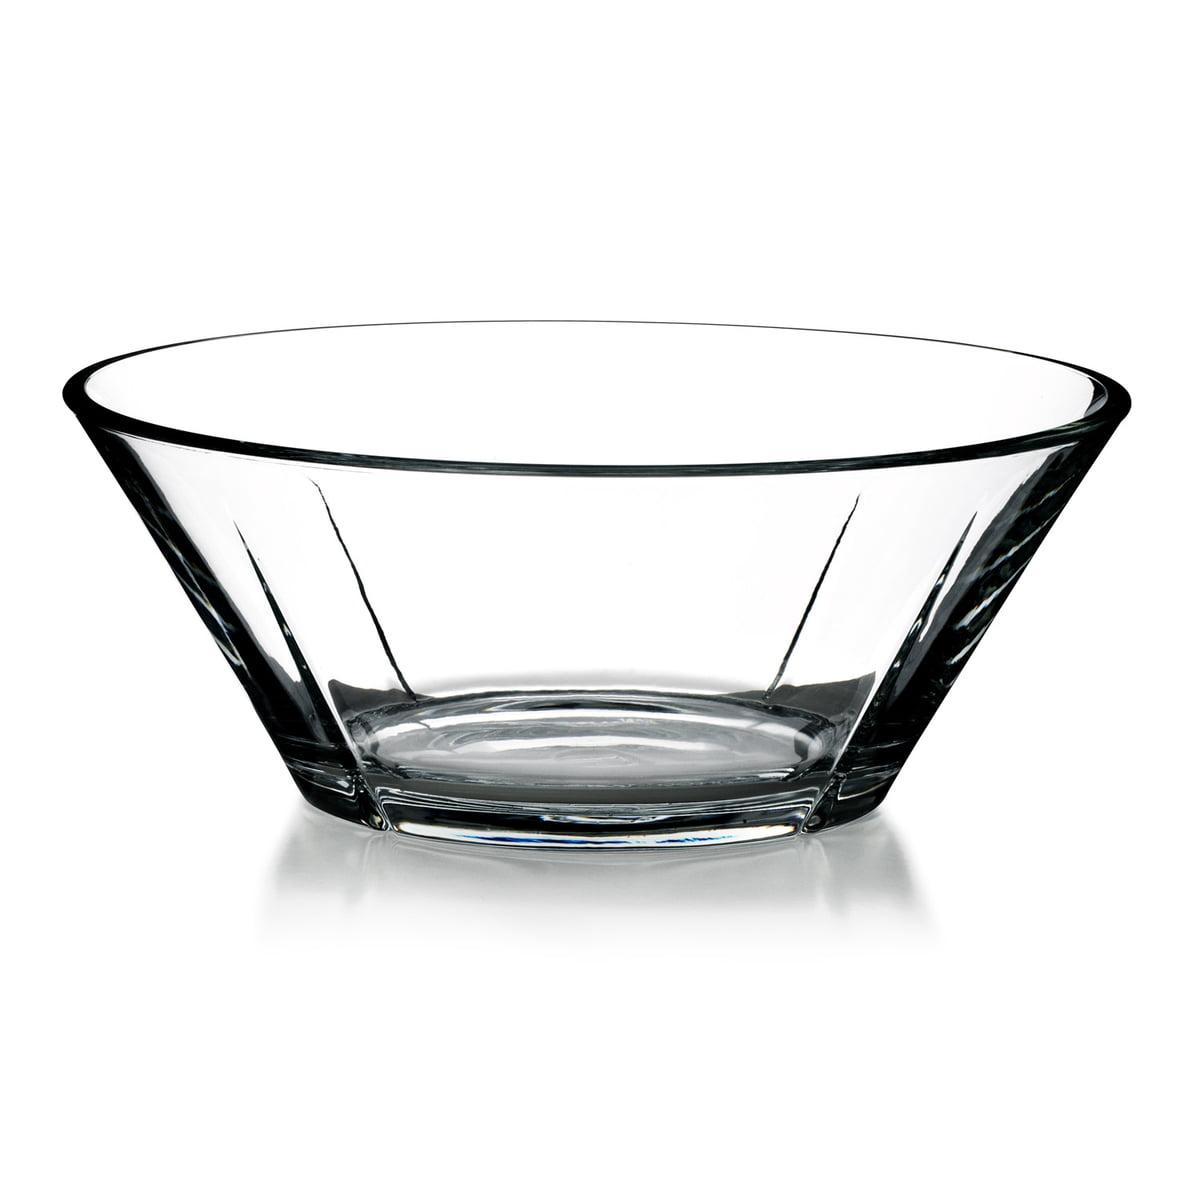 Grand Cru Glasschale, groß